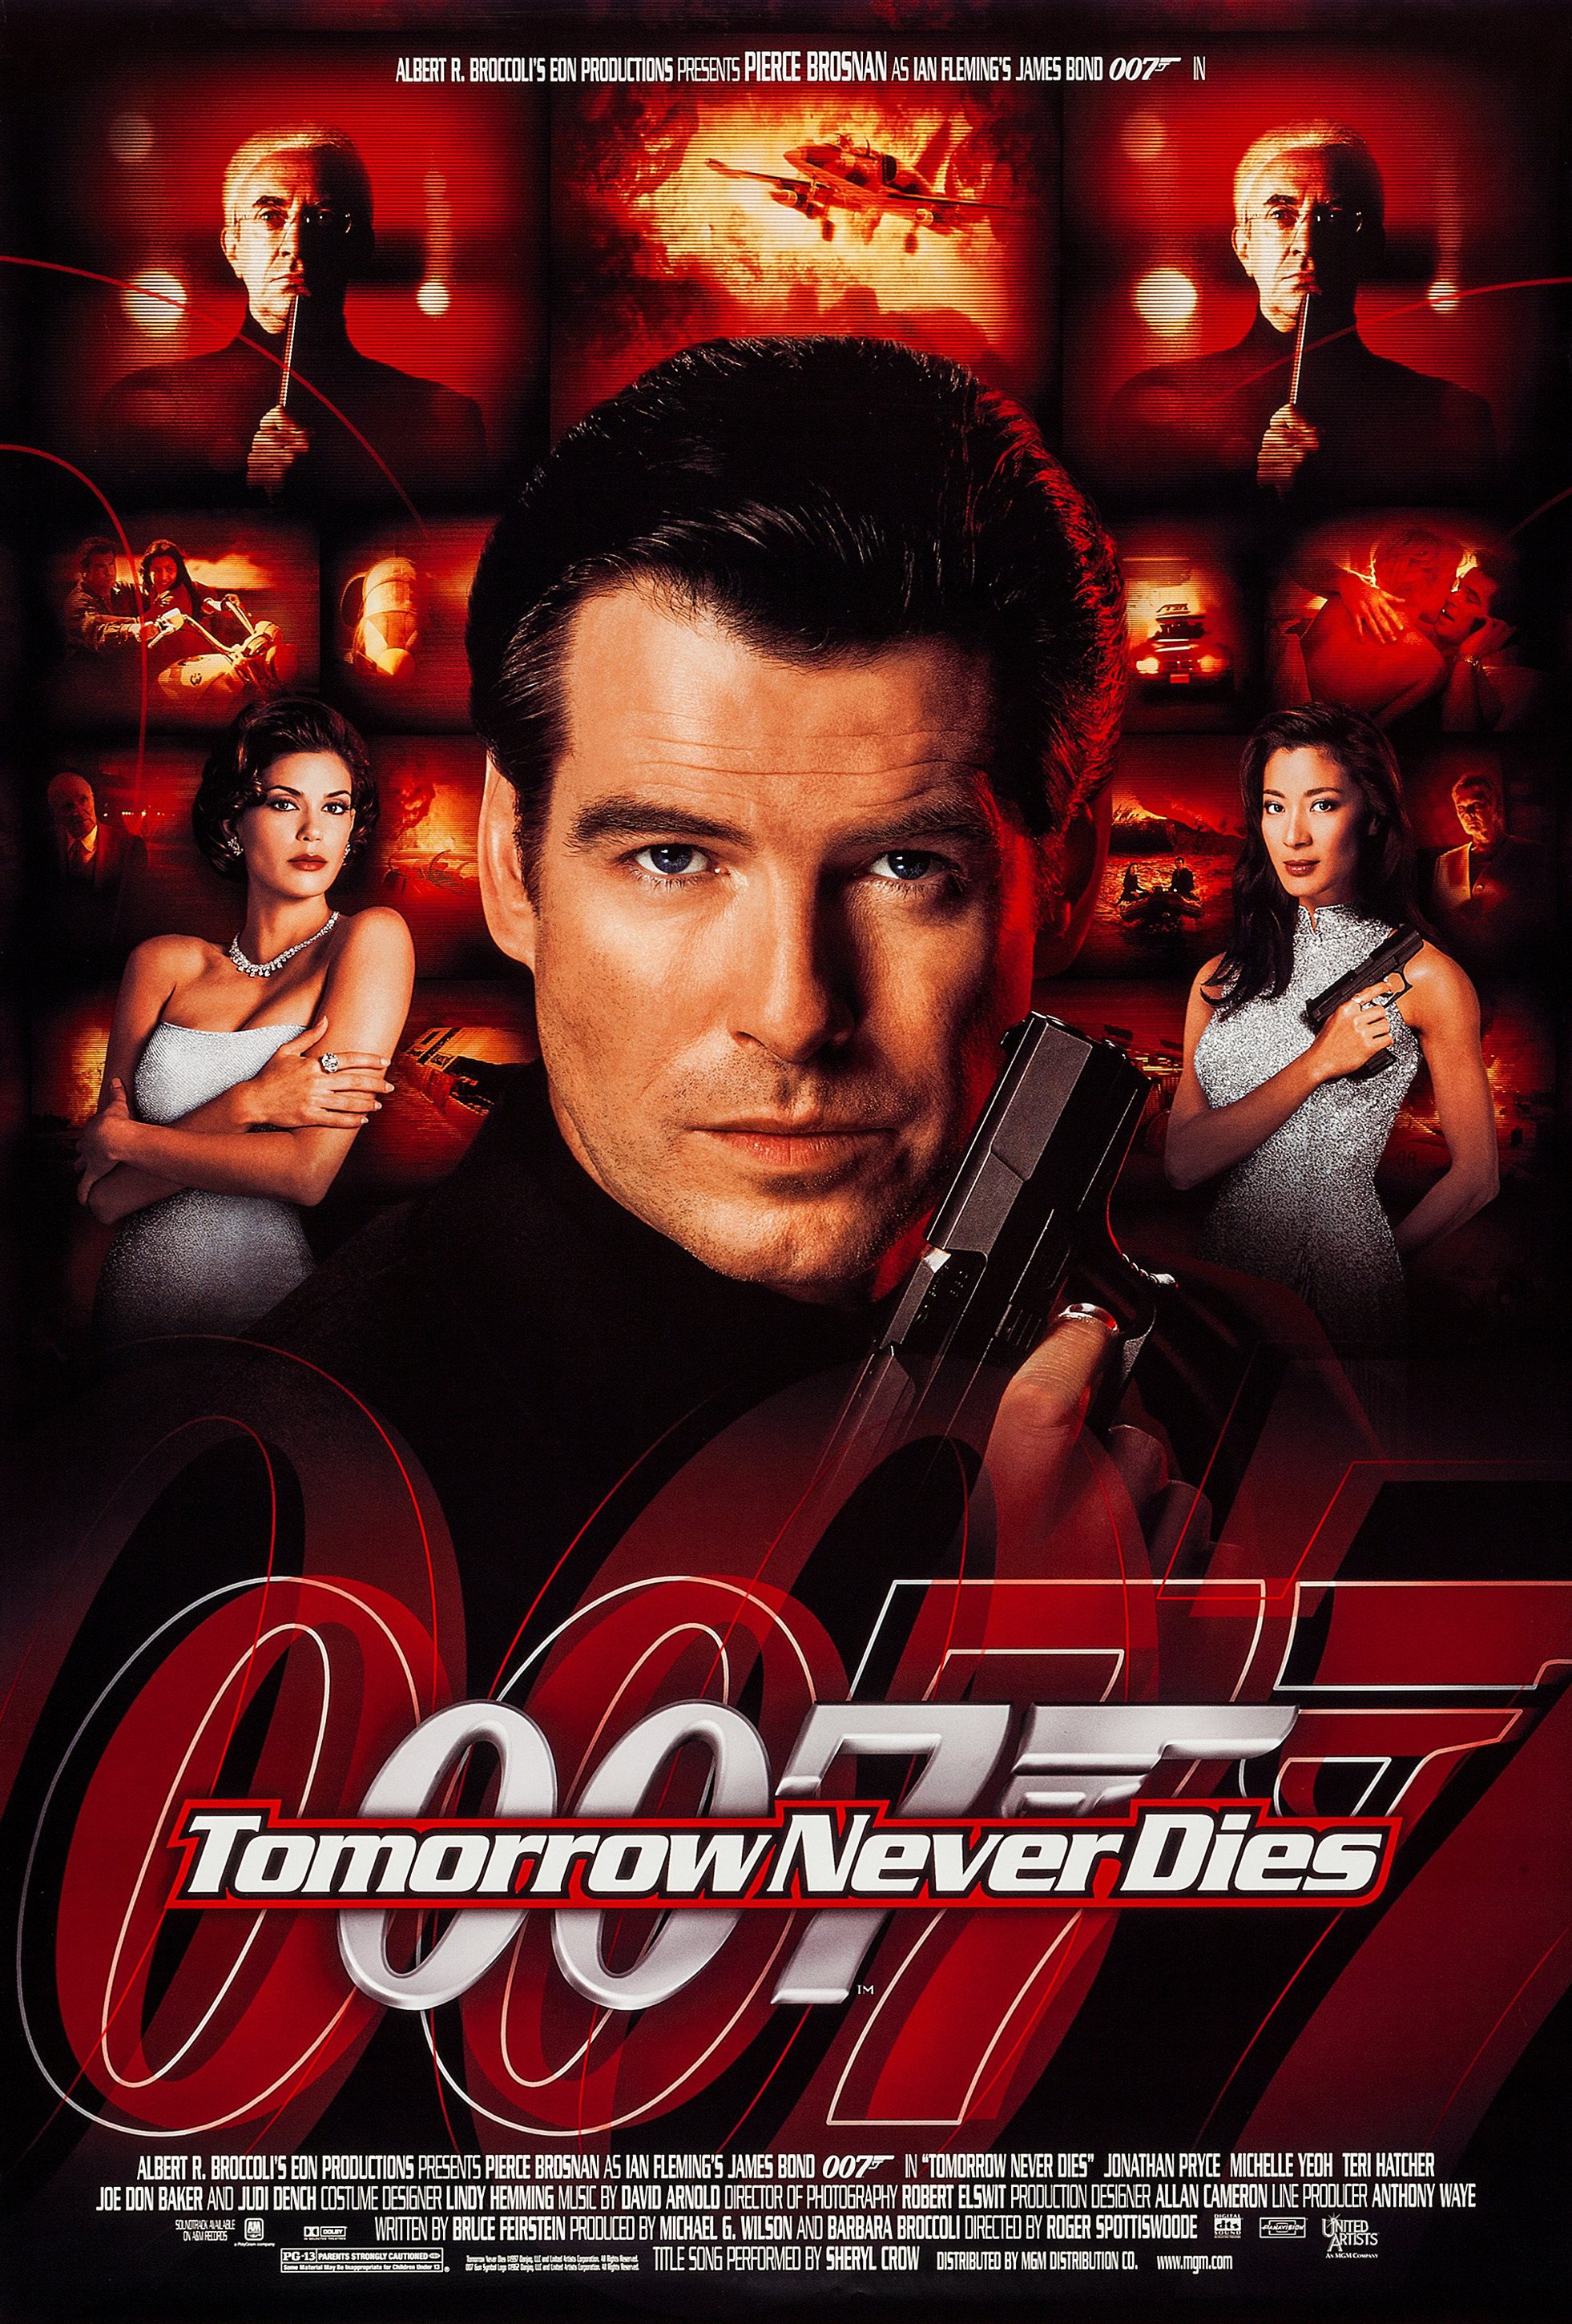 Tomorrow Never Dies Film James Bond Wiki Fandom